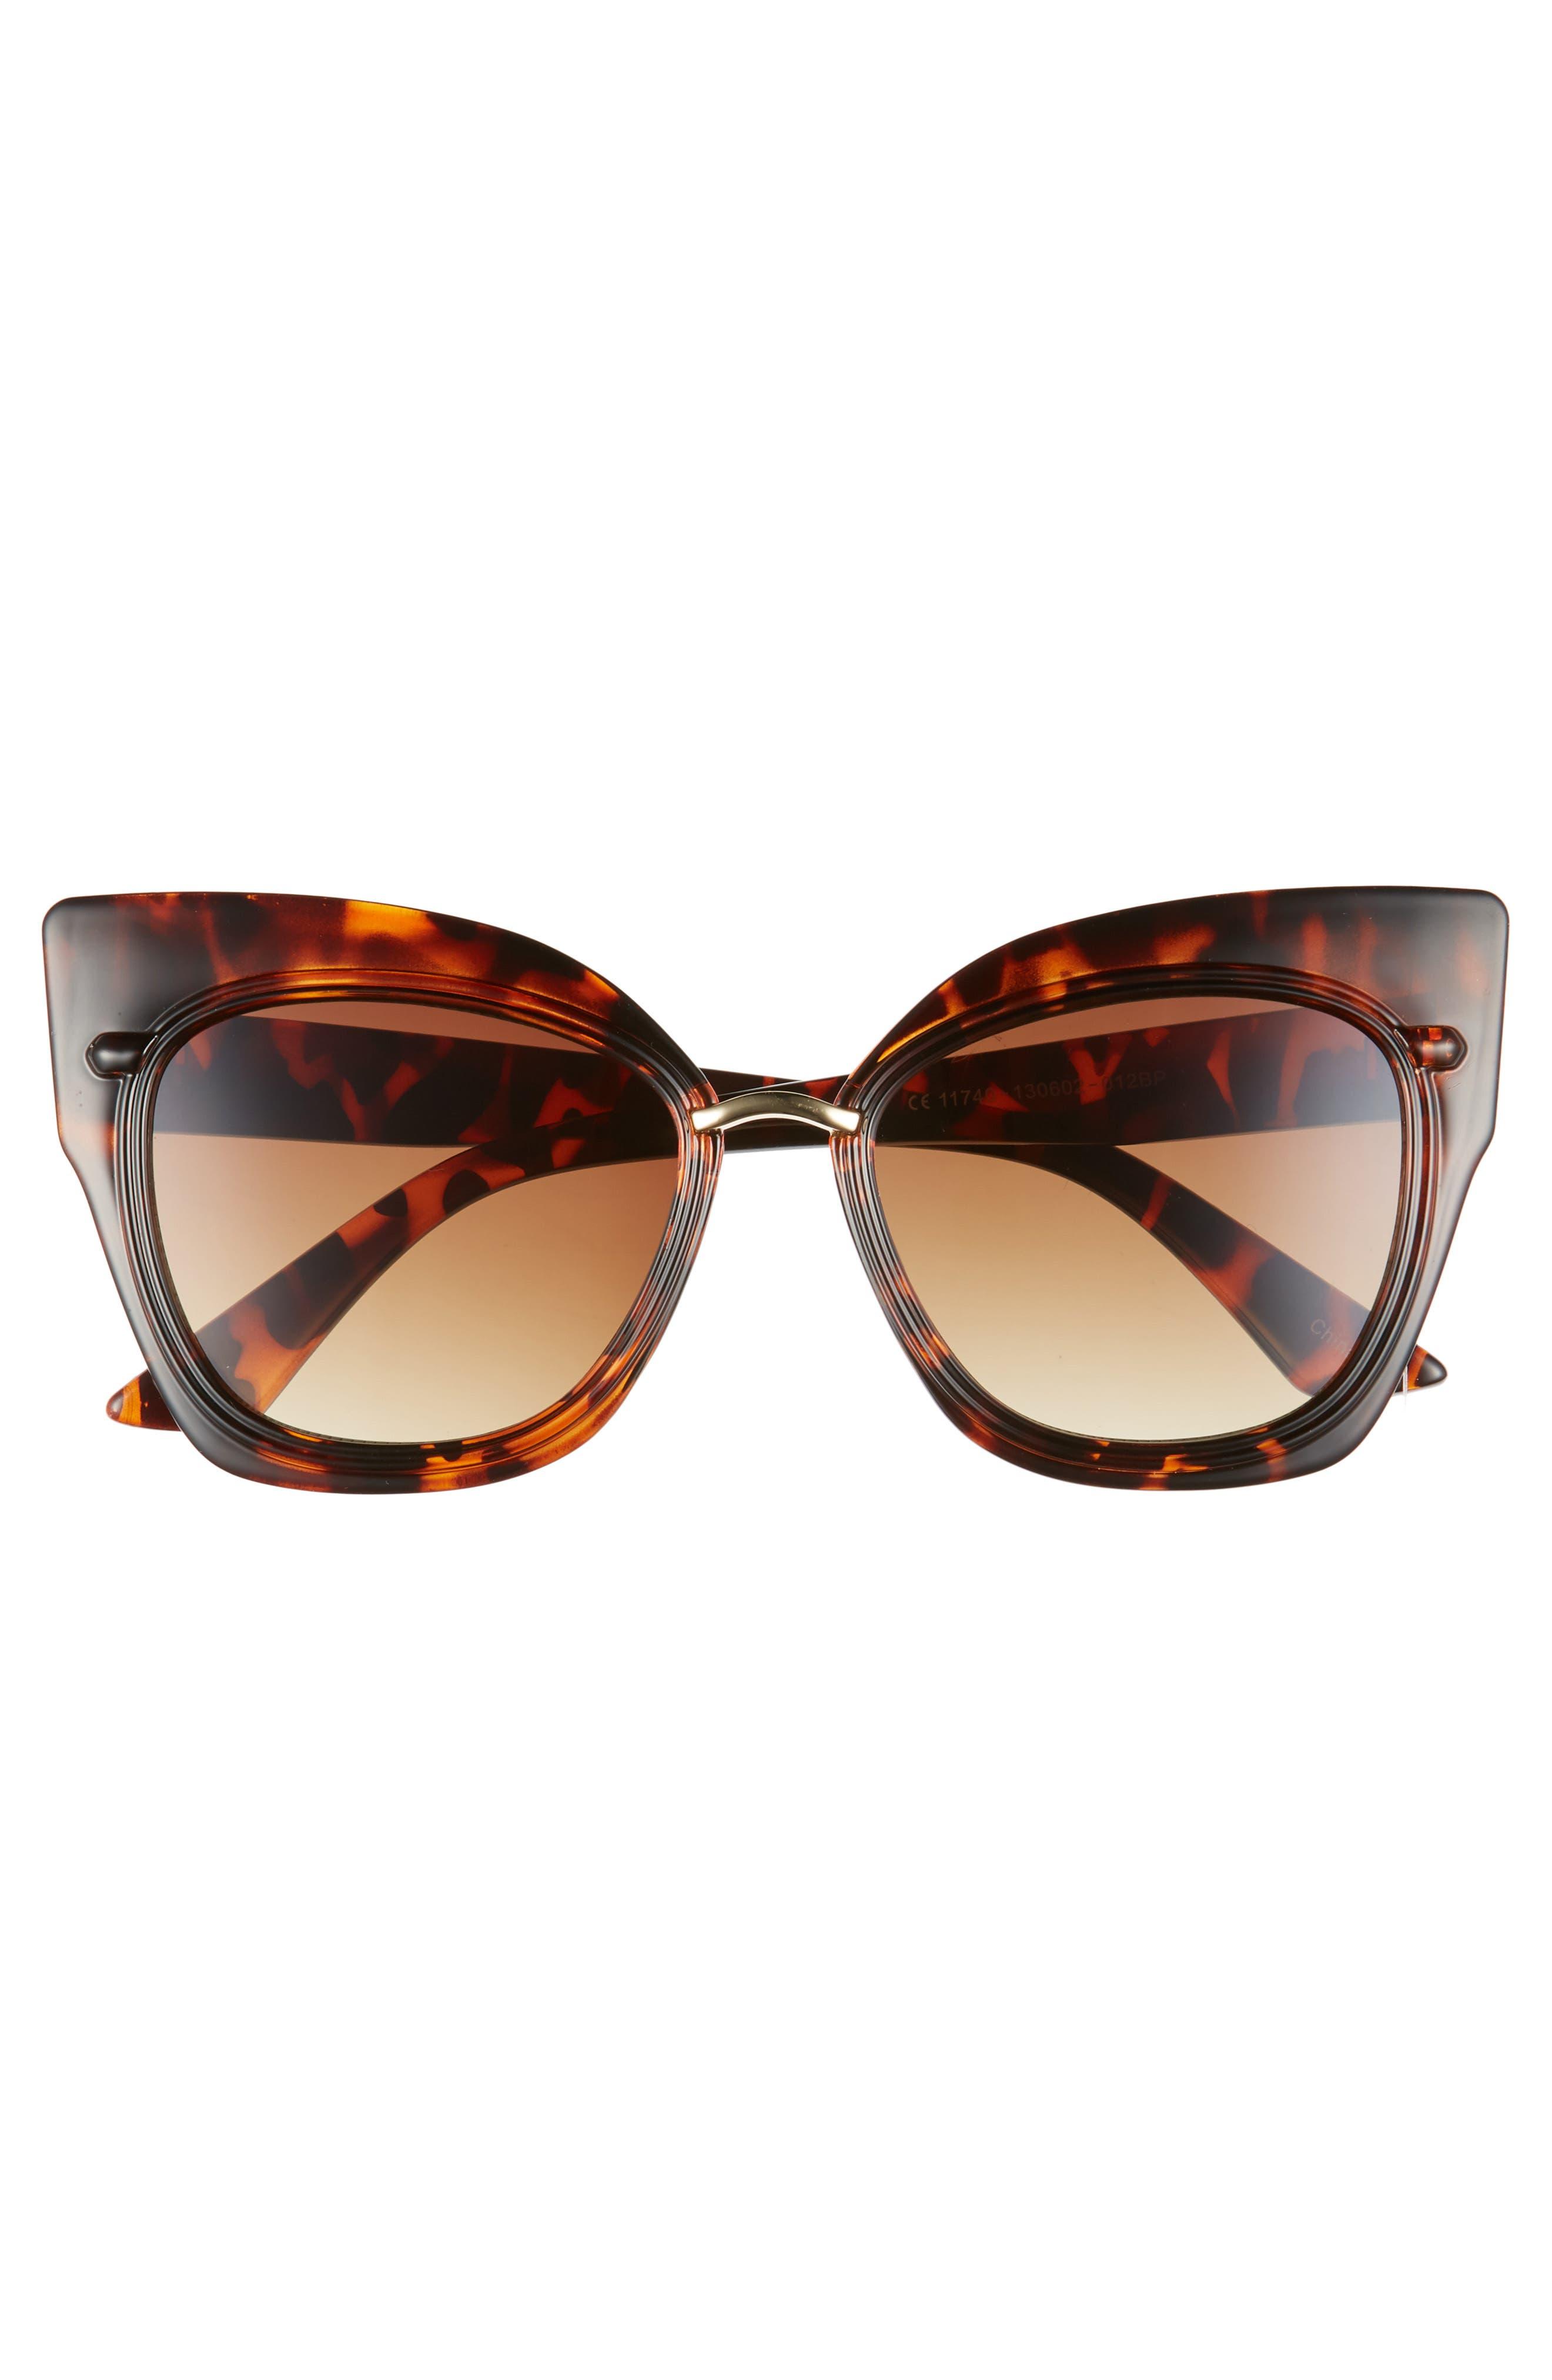 55mm Dual Oversized Cat Eye Sunglasses,                             Alternate thumbnail 3, color,                             200